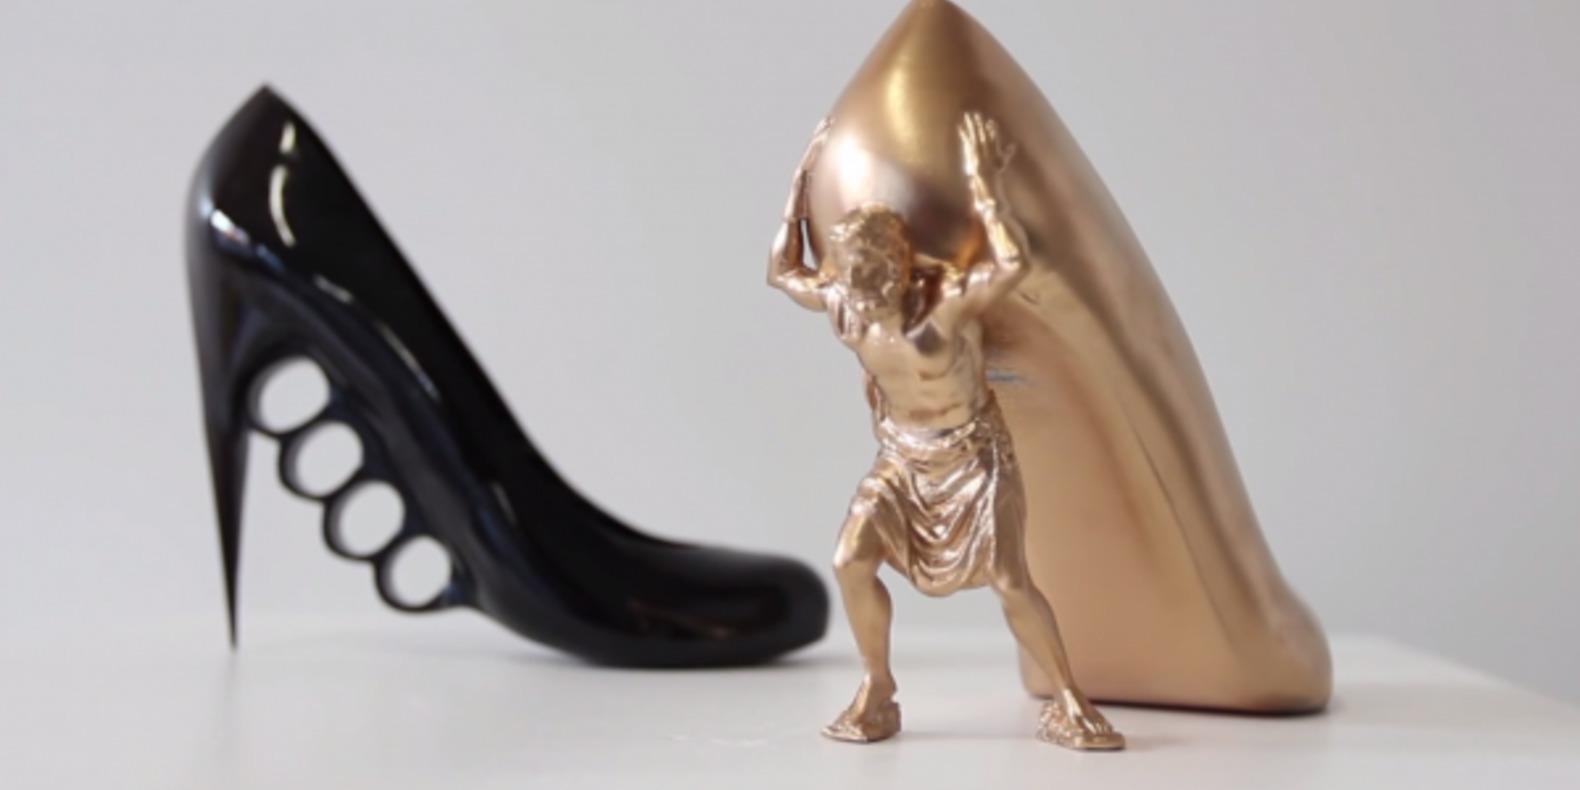 sebastian errazuriz shoe 3D print cults chaussures imprimees en 3D makerbot melissa designer 3D 12